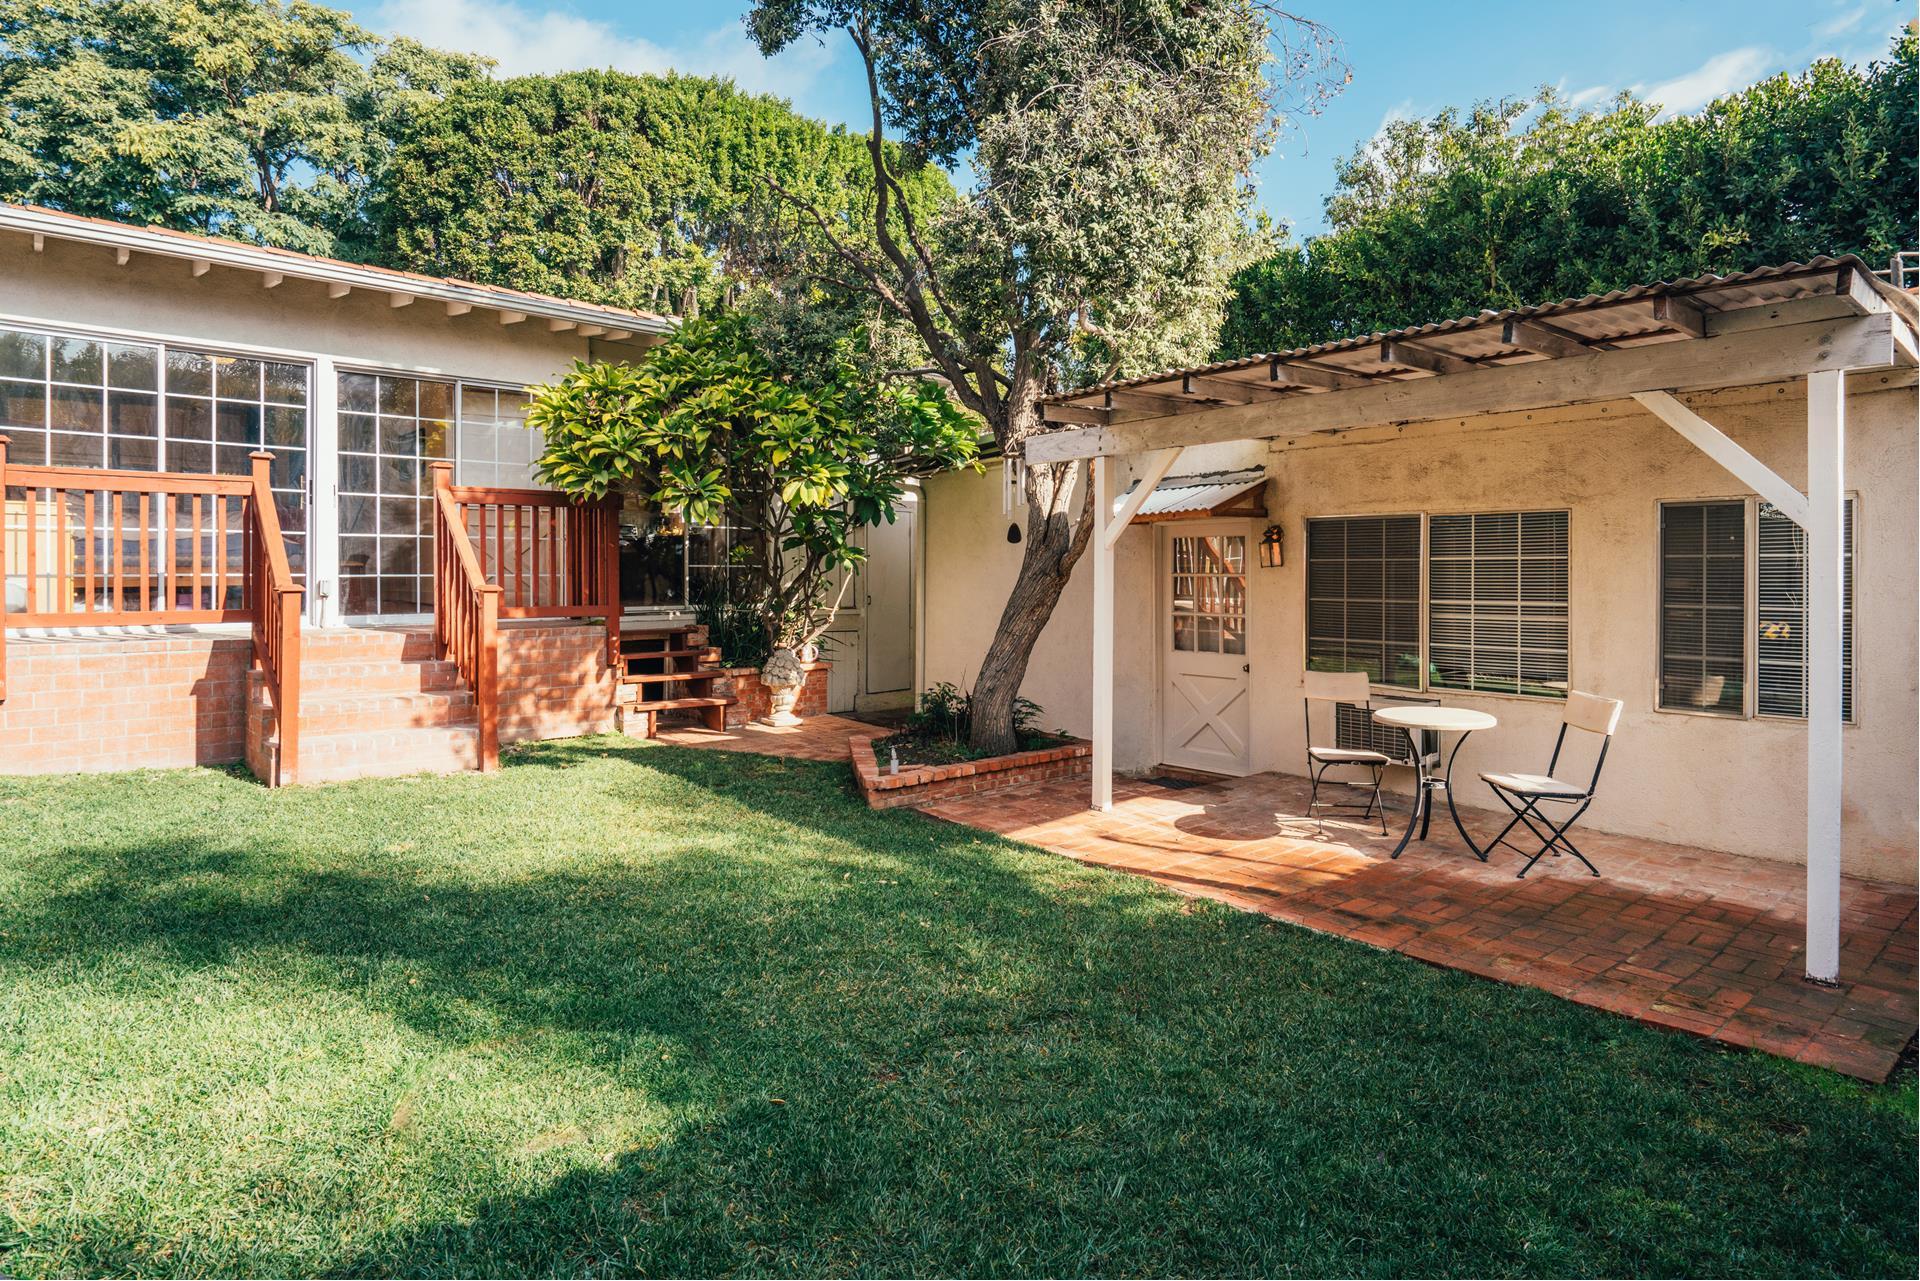 9036 KEITH Avenue - West Hollywood, California